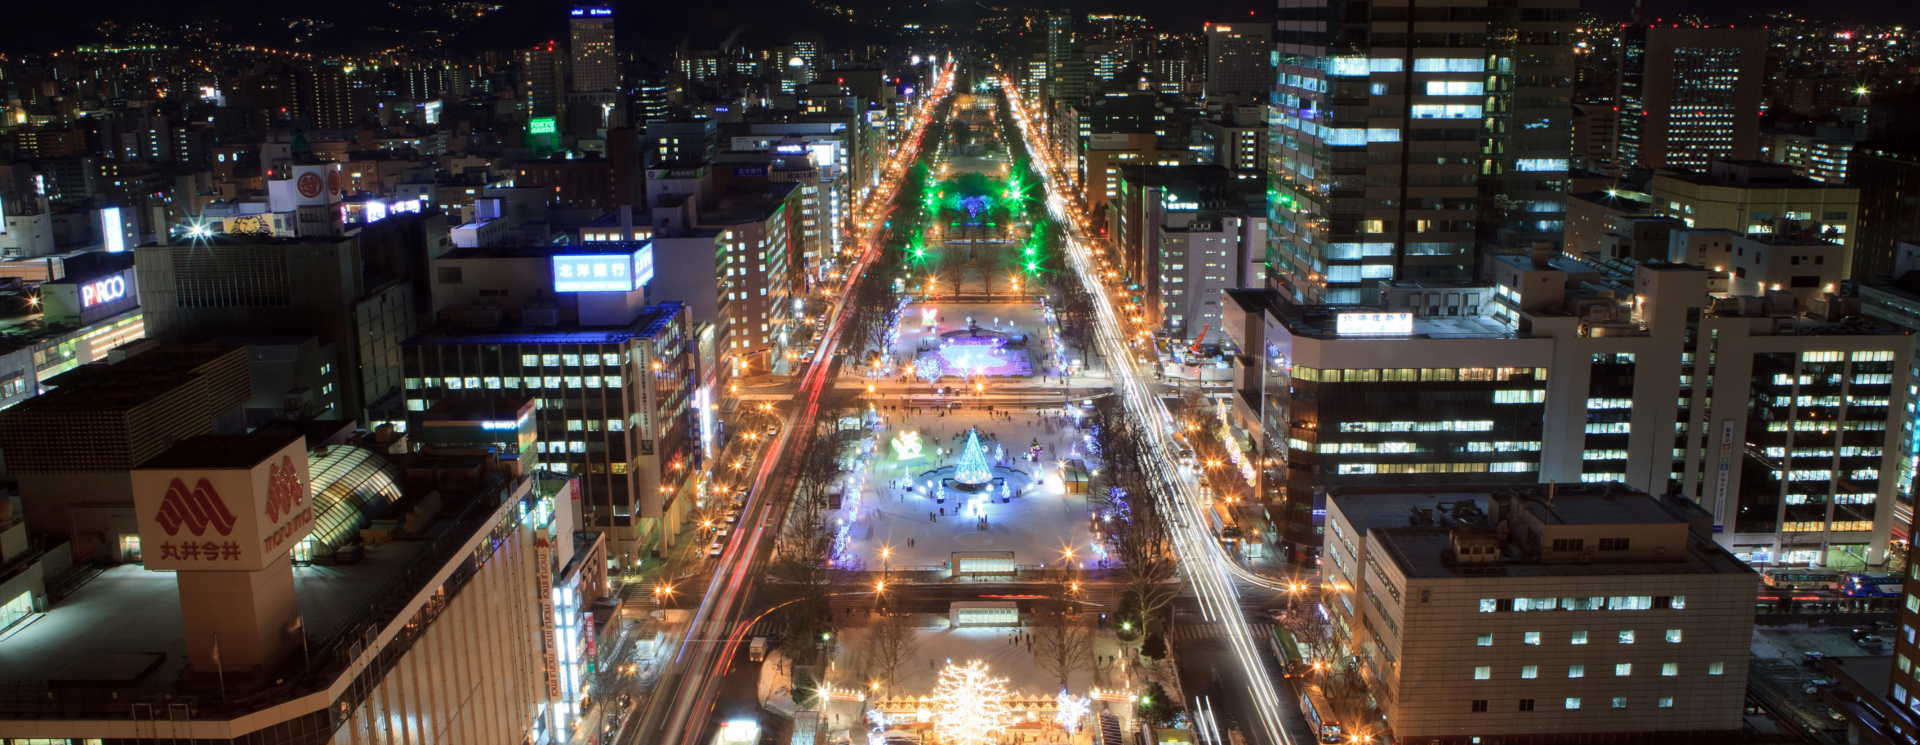 SapporoWinter1920-750-50